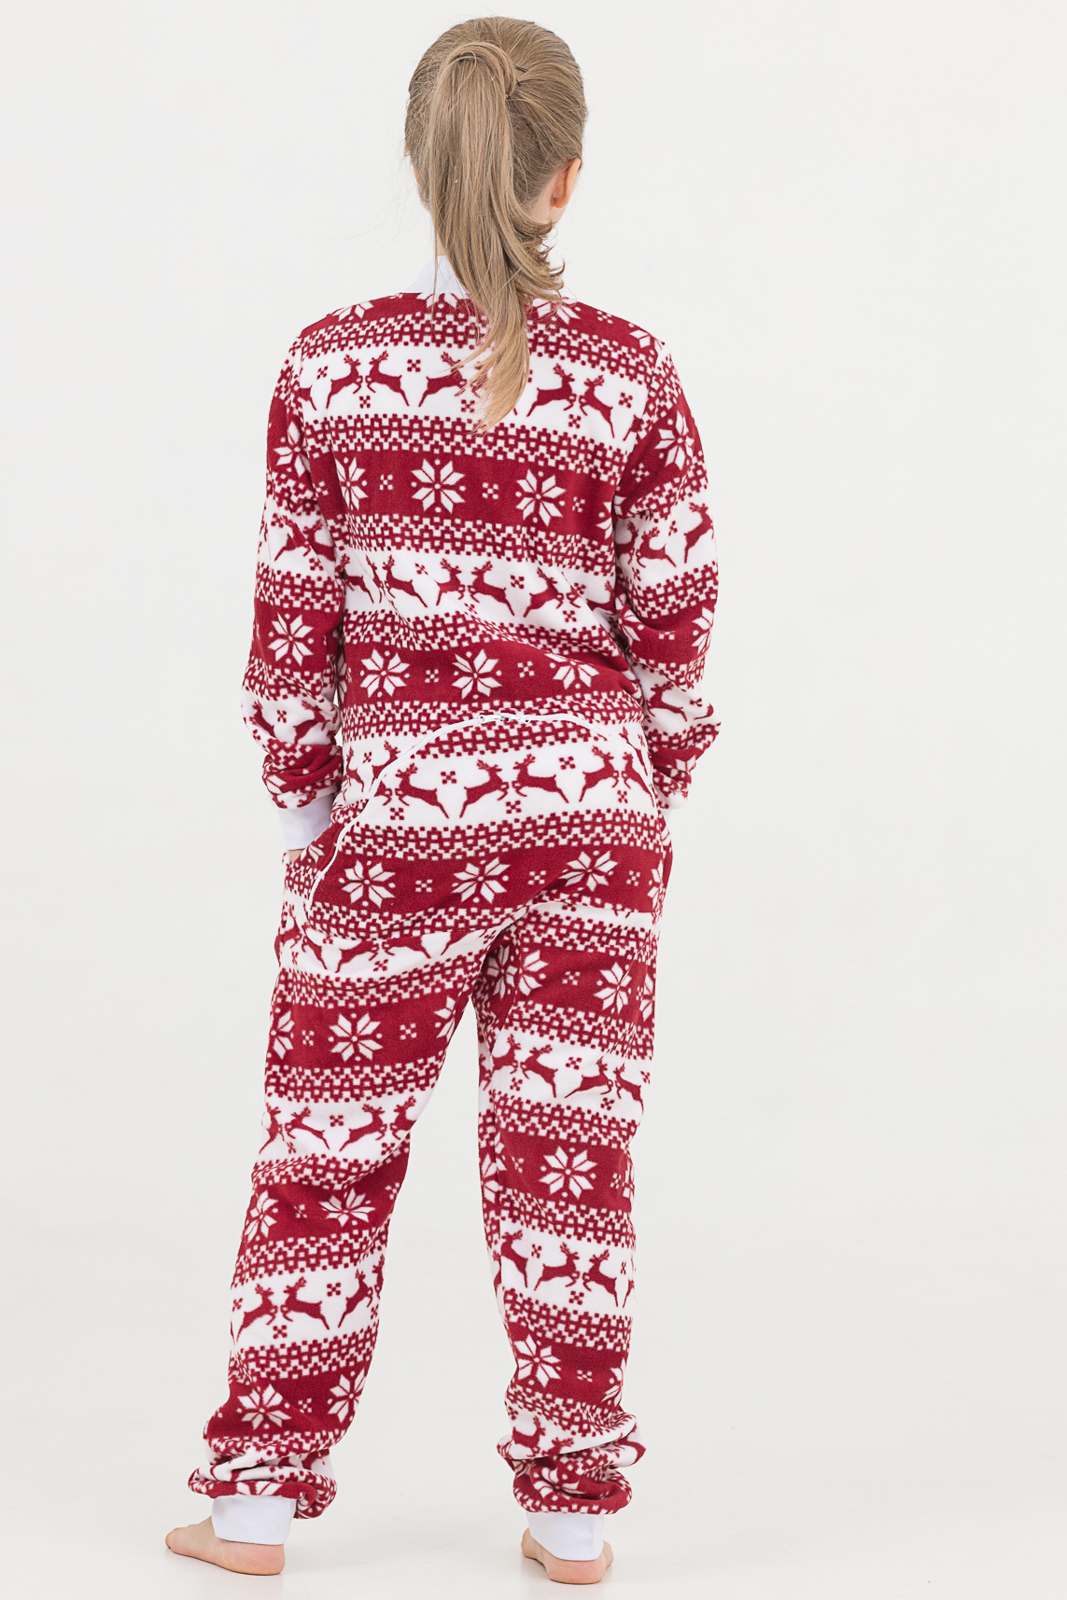 cdb518311392 Детская пижама-комбинезон